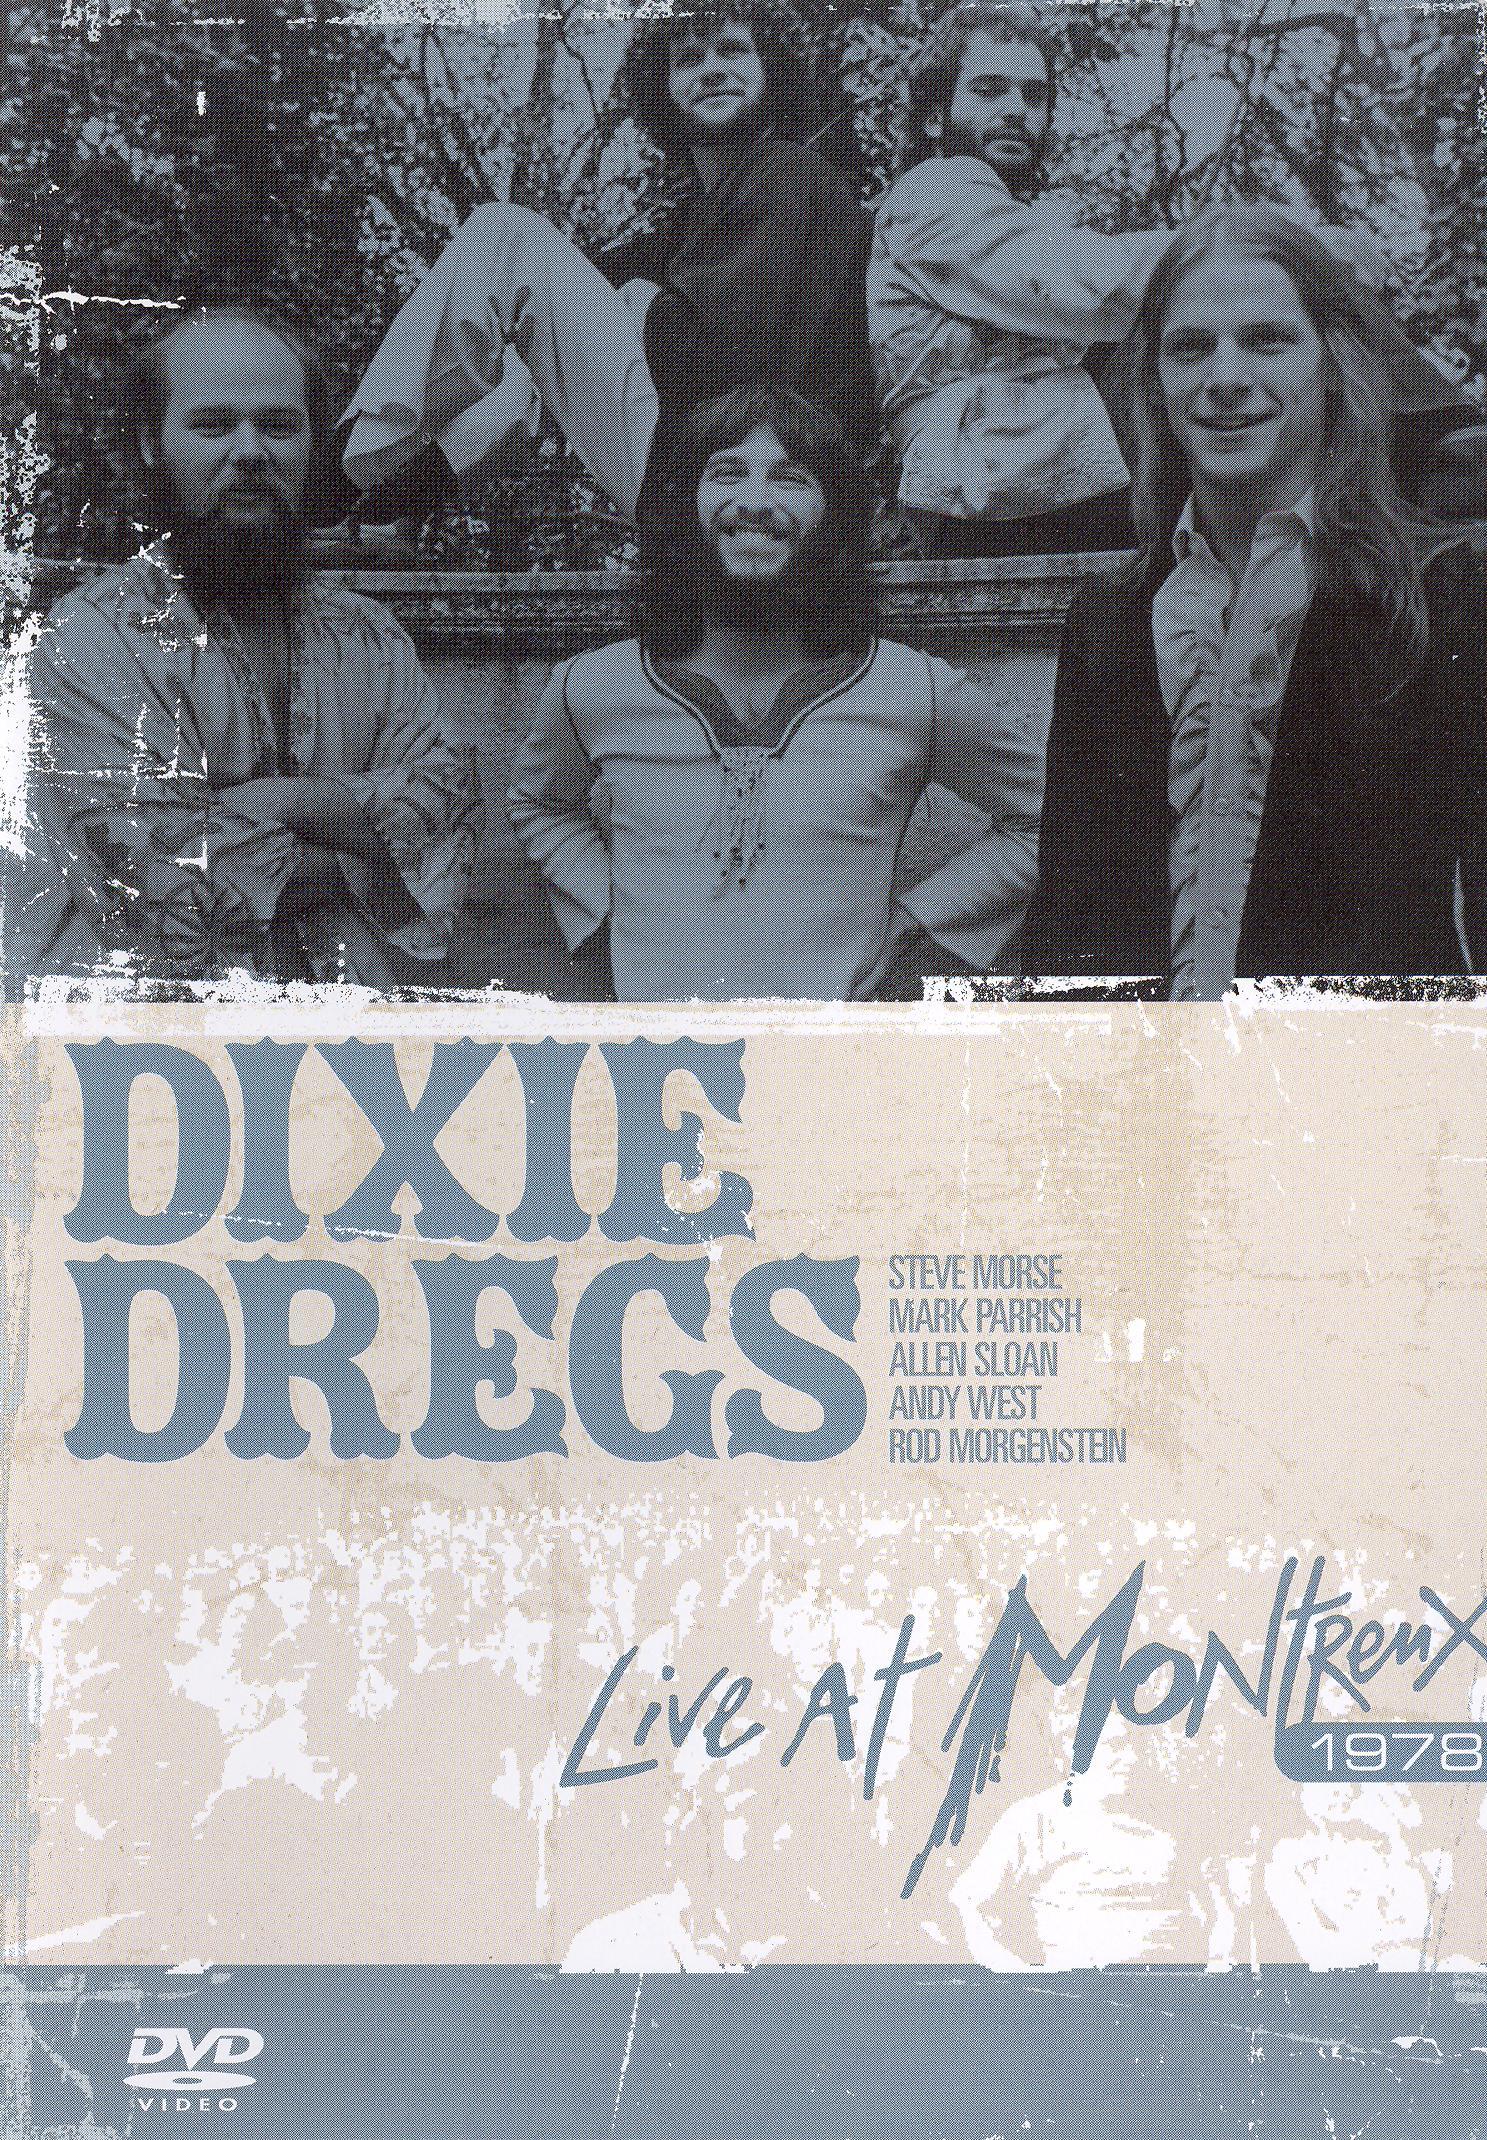 Dixie Dregs: Live at the Montreux Jazz Festival 1978